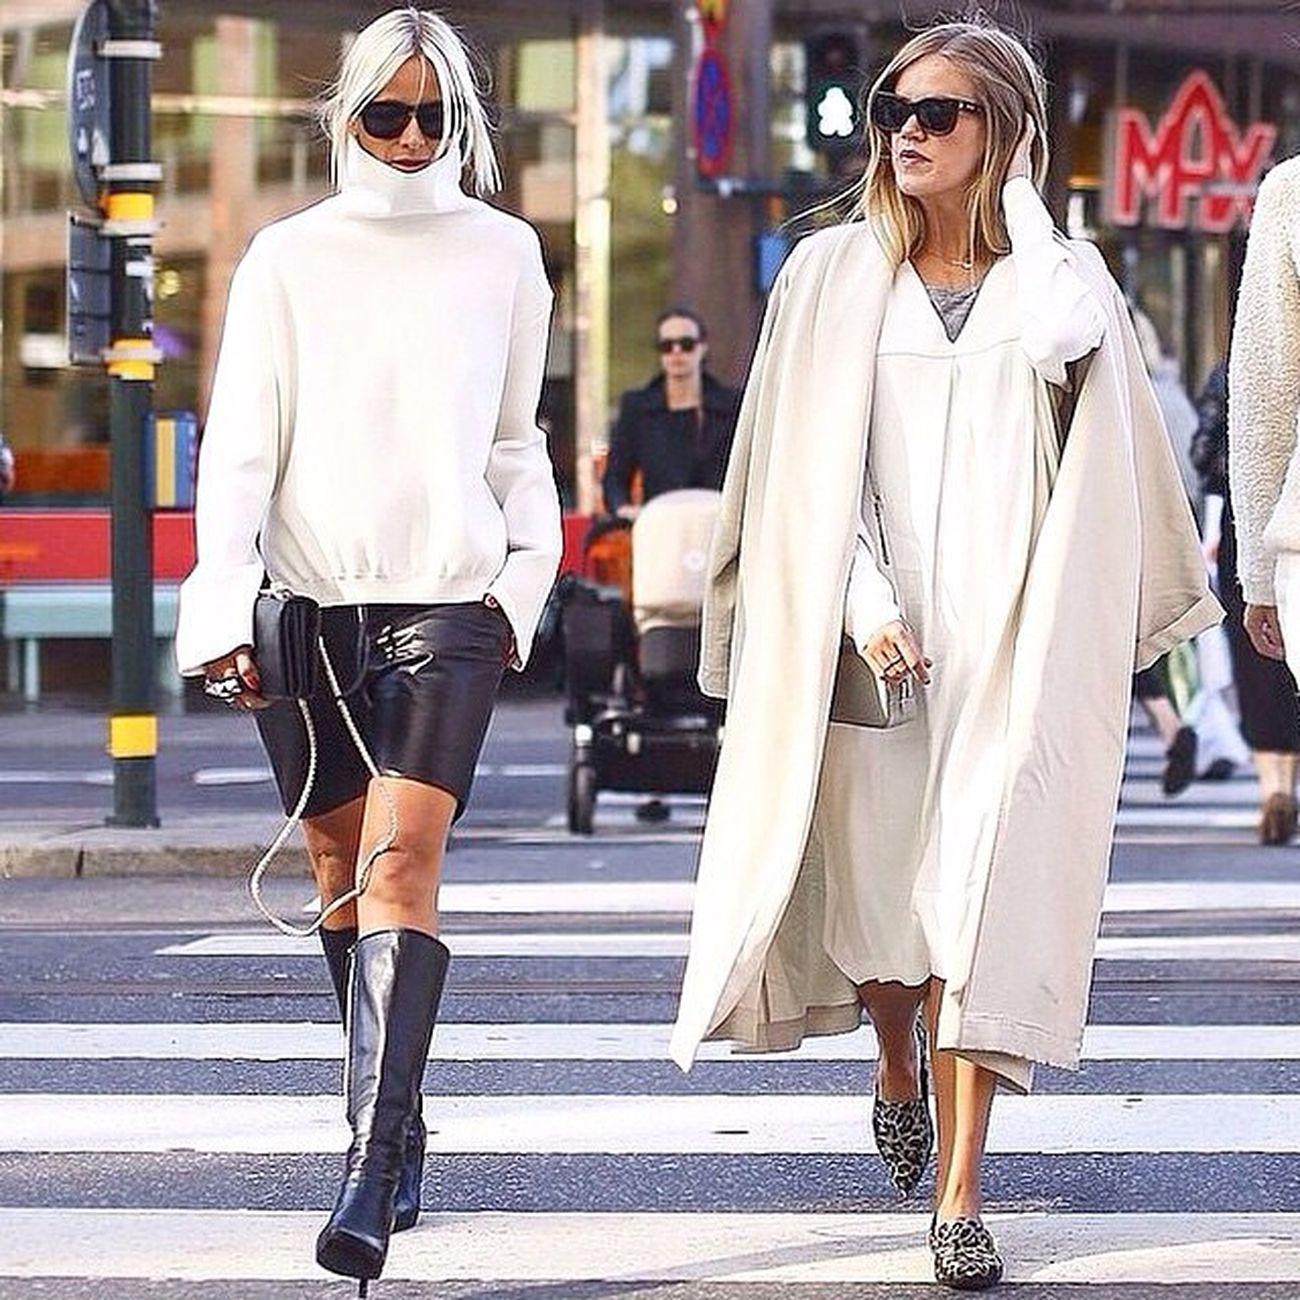 Repost from @4fashionist Winter White ⚪️ Fashion Style Instafashion Instastyle blog blogger instablog instablogger stylish fashionblog fashionblogger love like likeit instalove instalike igers all_shots tagsforlikes